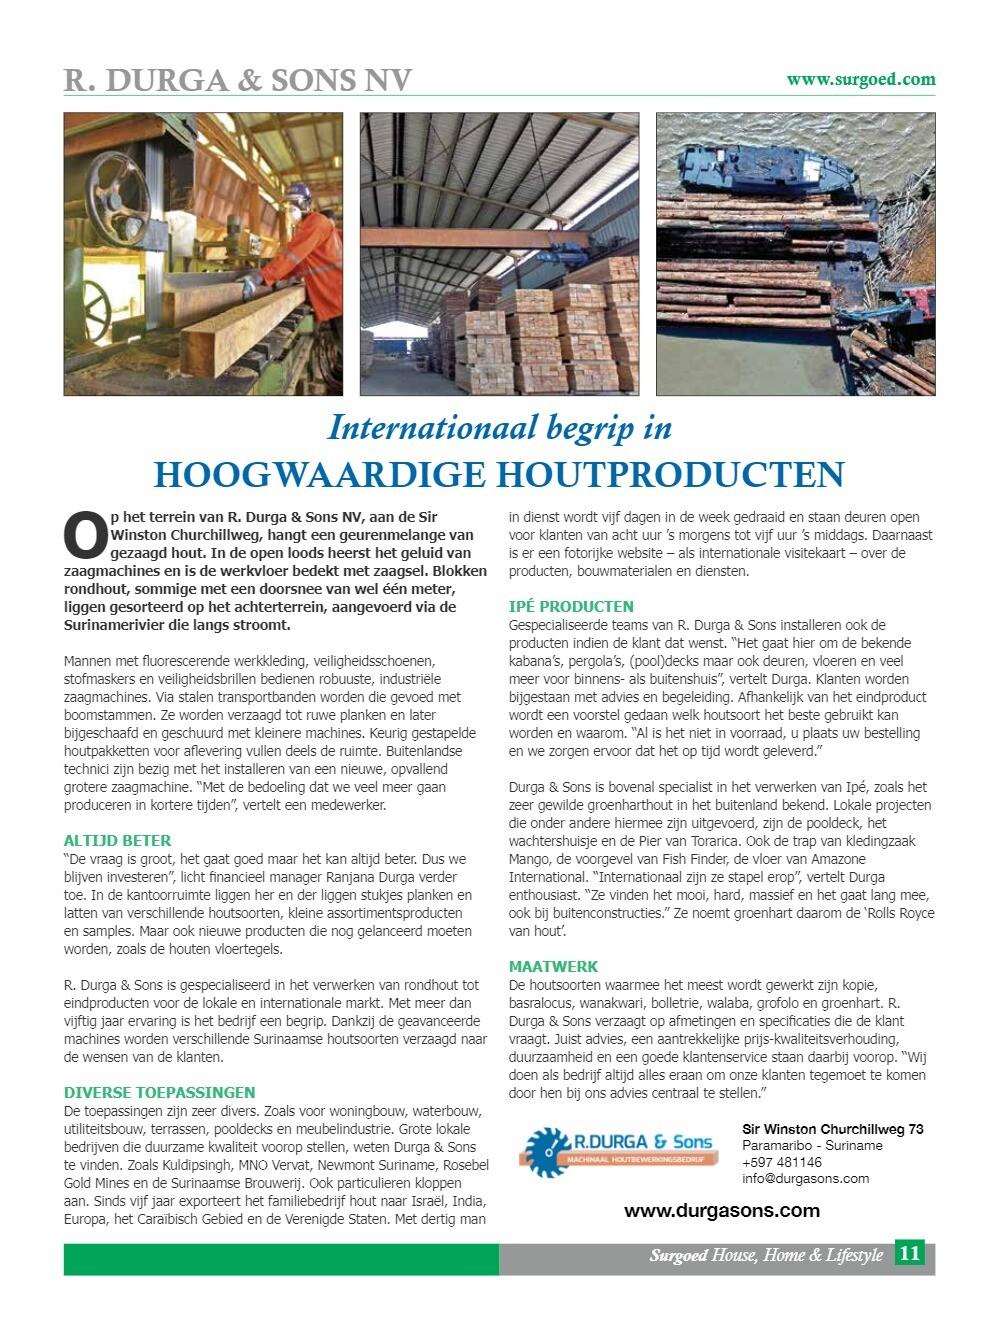 Internationaal begrip in hoogwaardige houtproducten